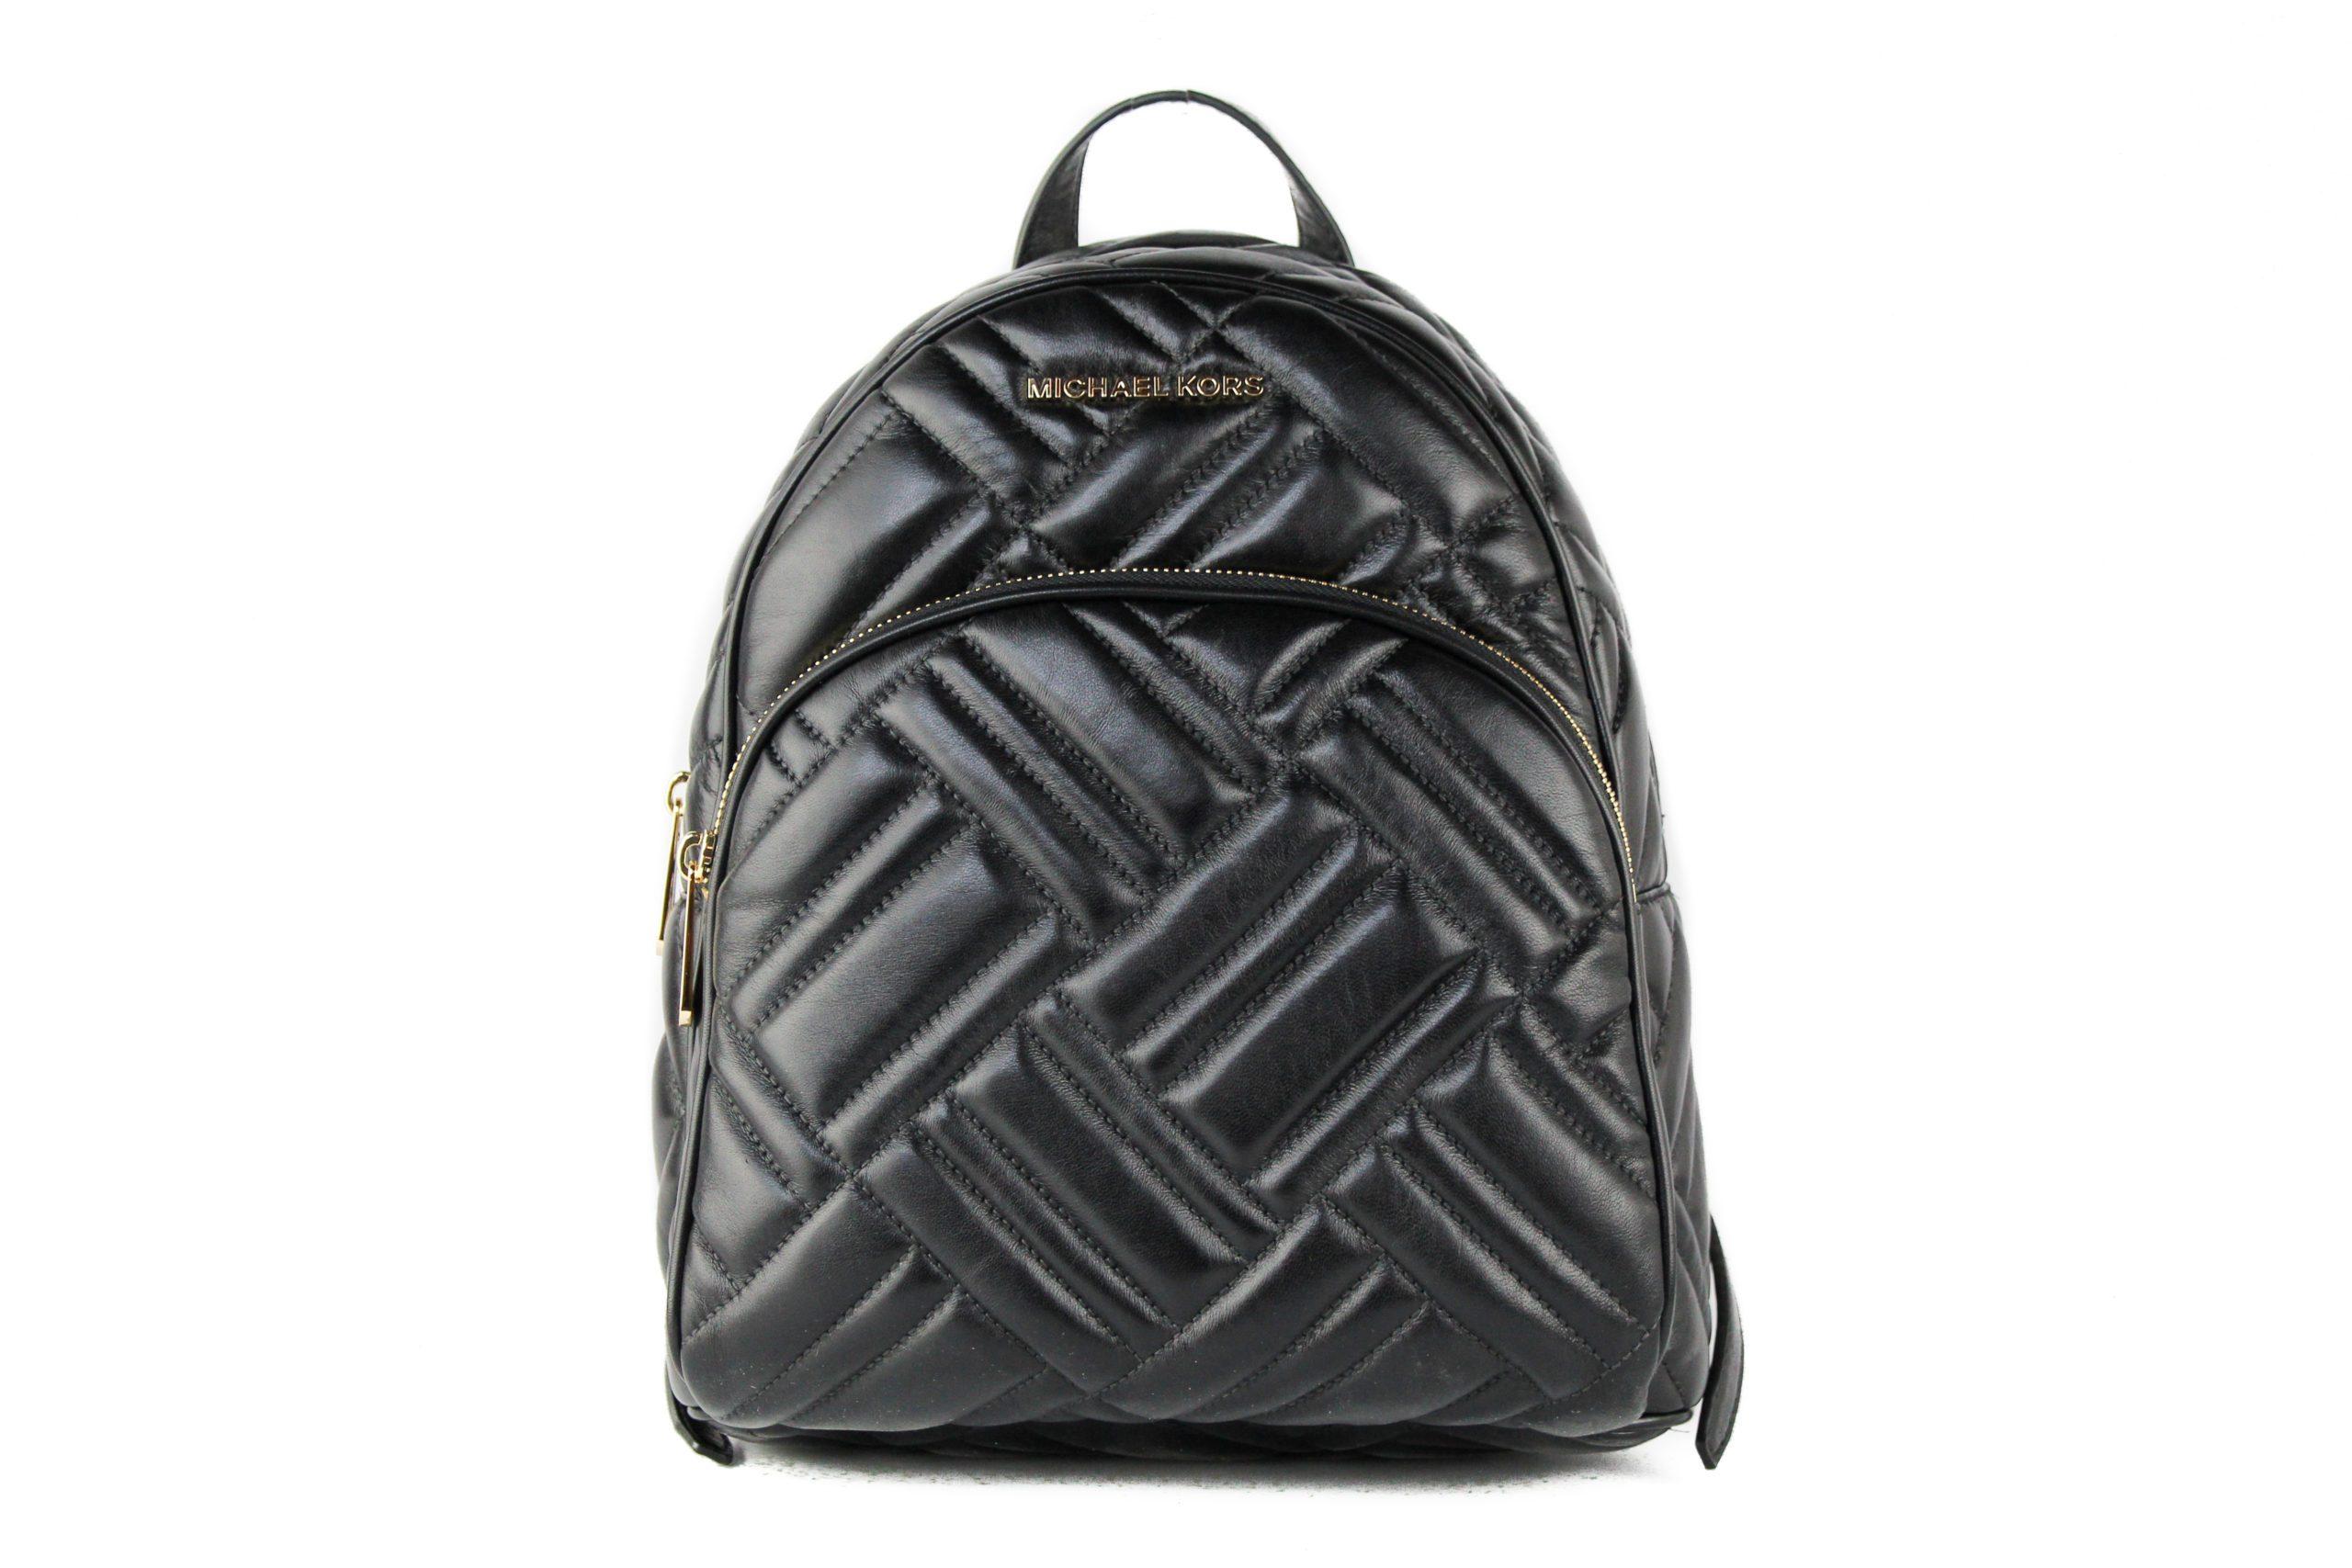 Michael Kors Women's Abbey Backpack Black 22085